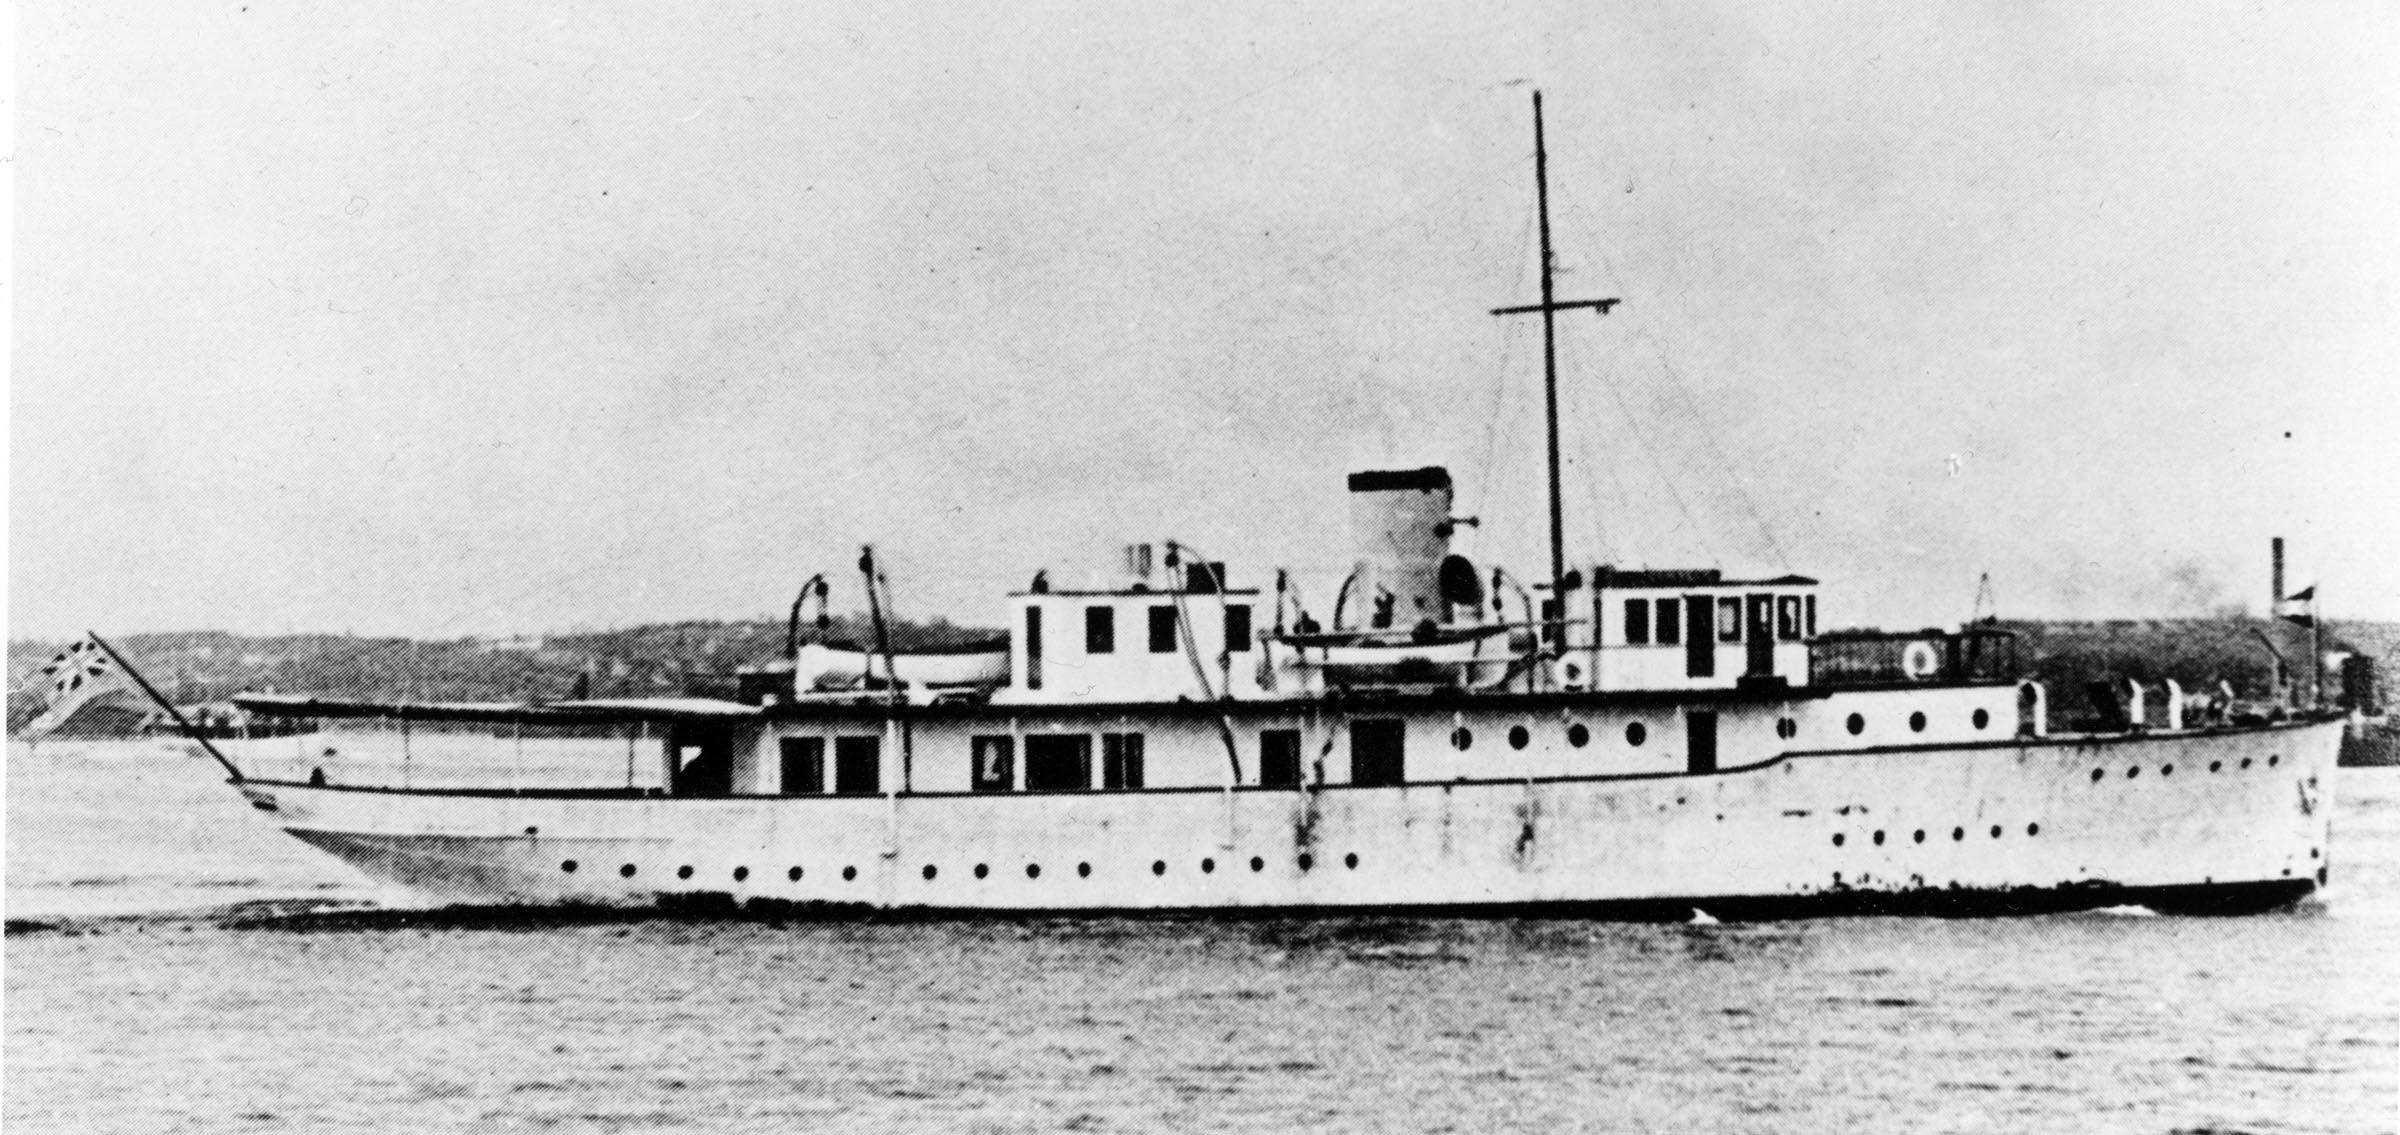 HMCS OTTER